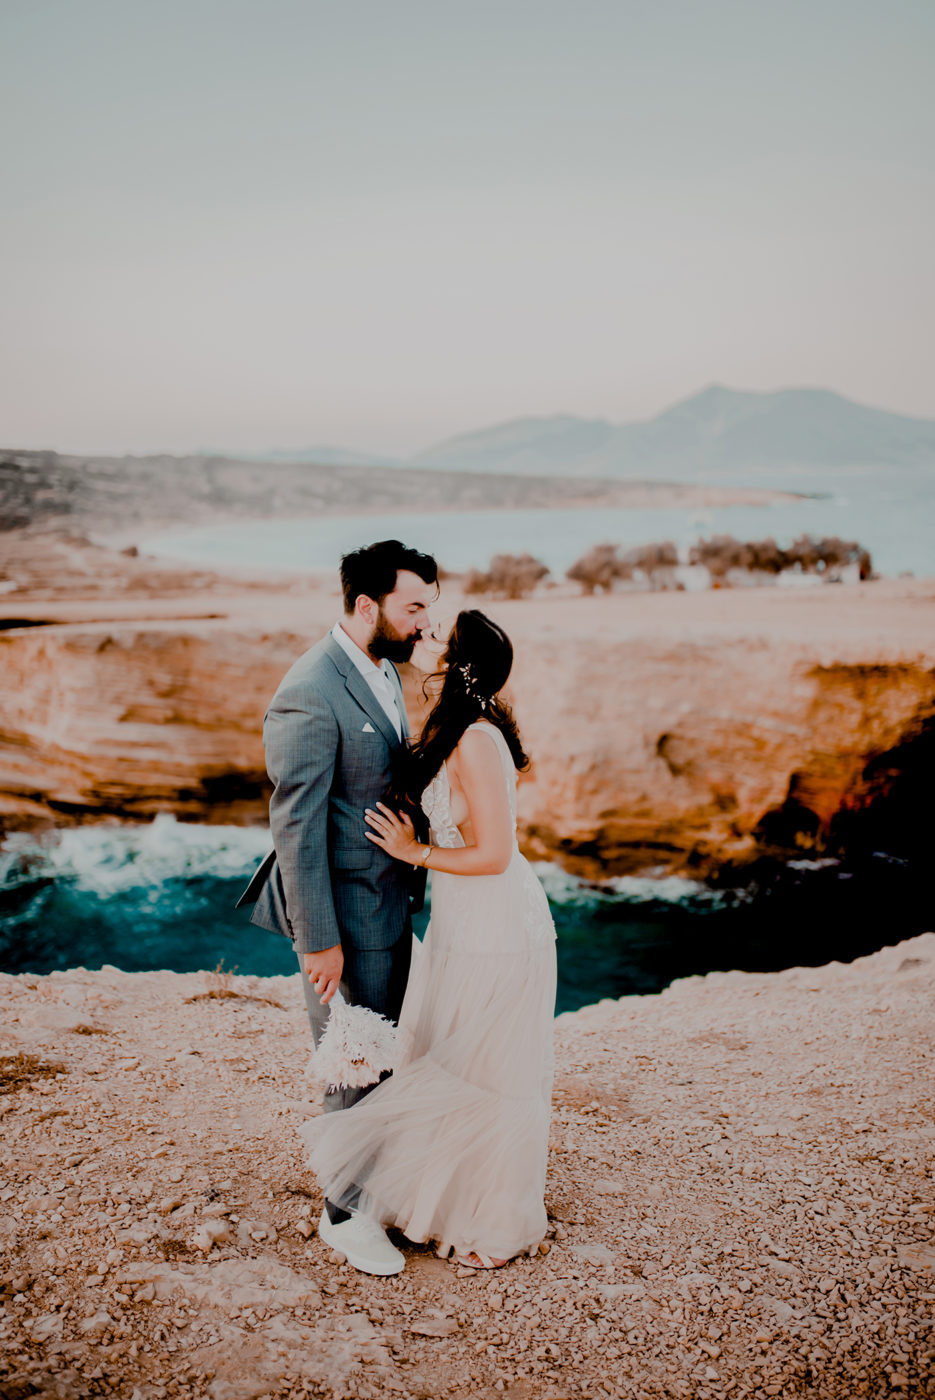 kirill-samarits-wedding-photography-koufonisia-greece-couple-photographer (9)